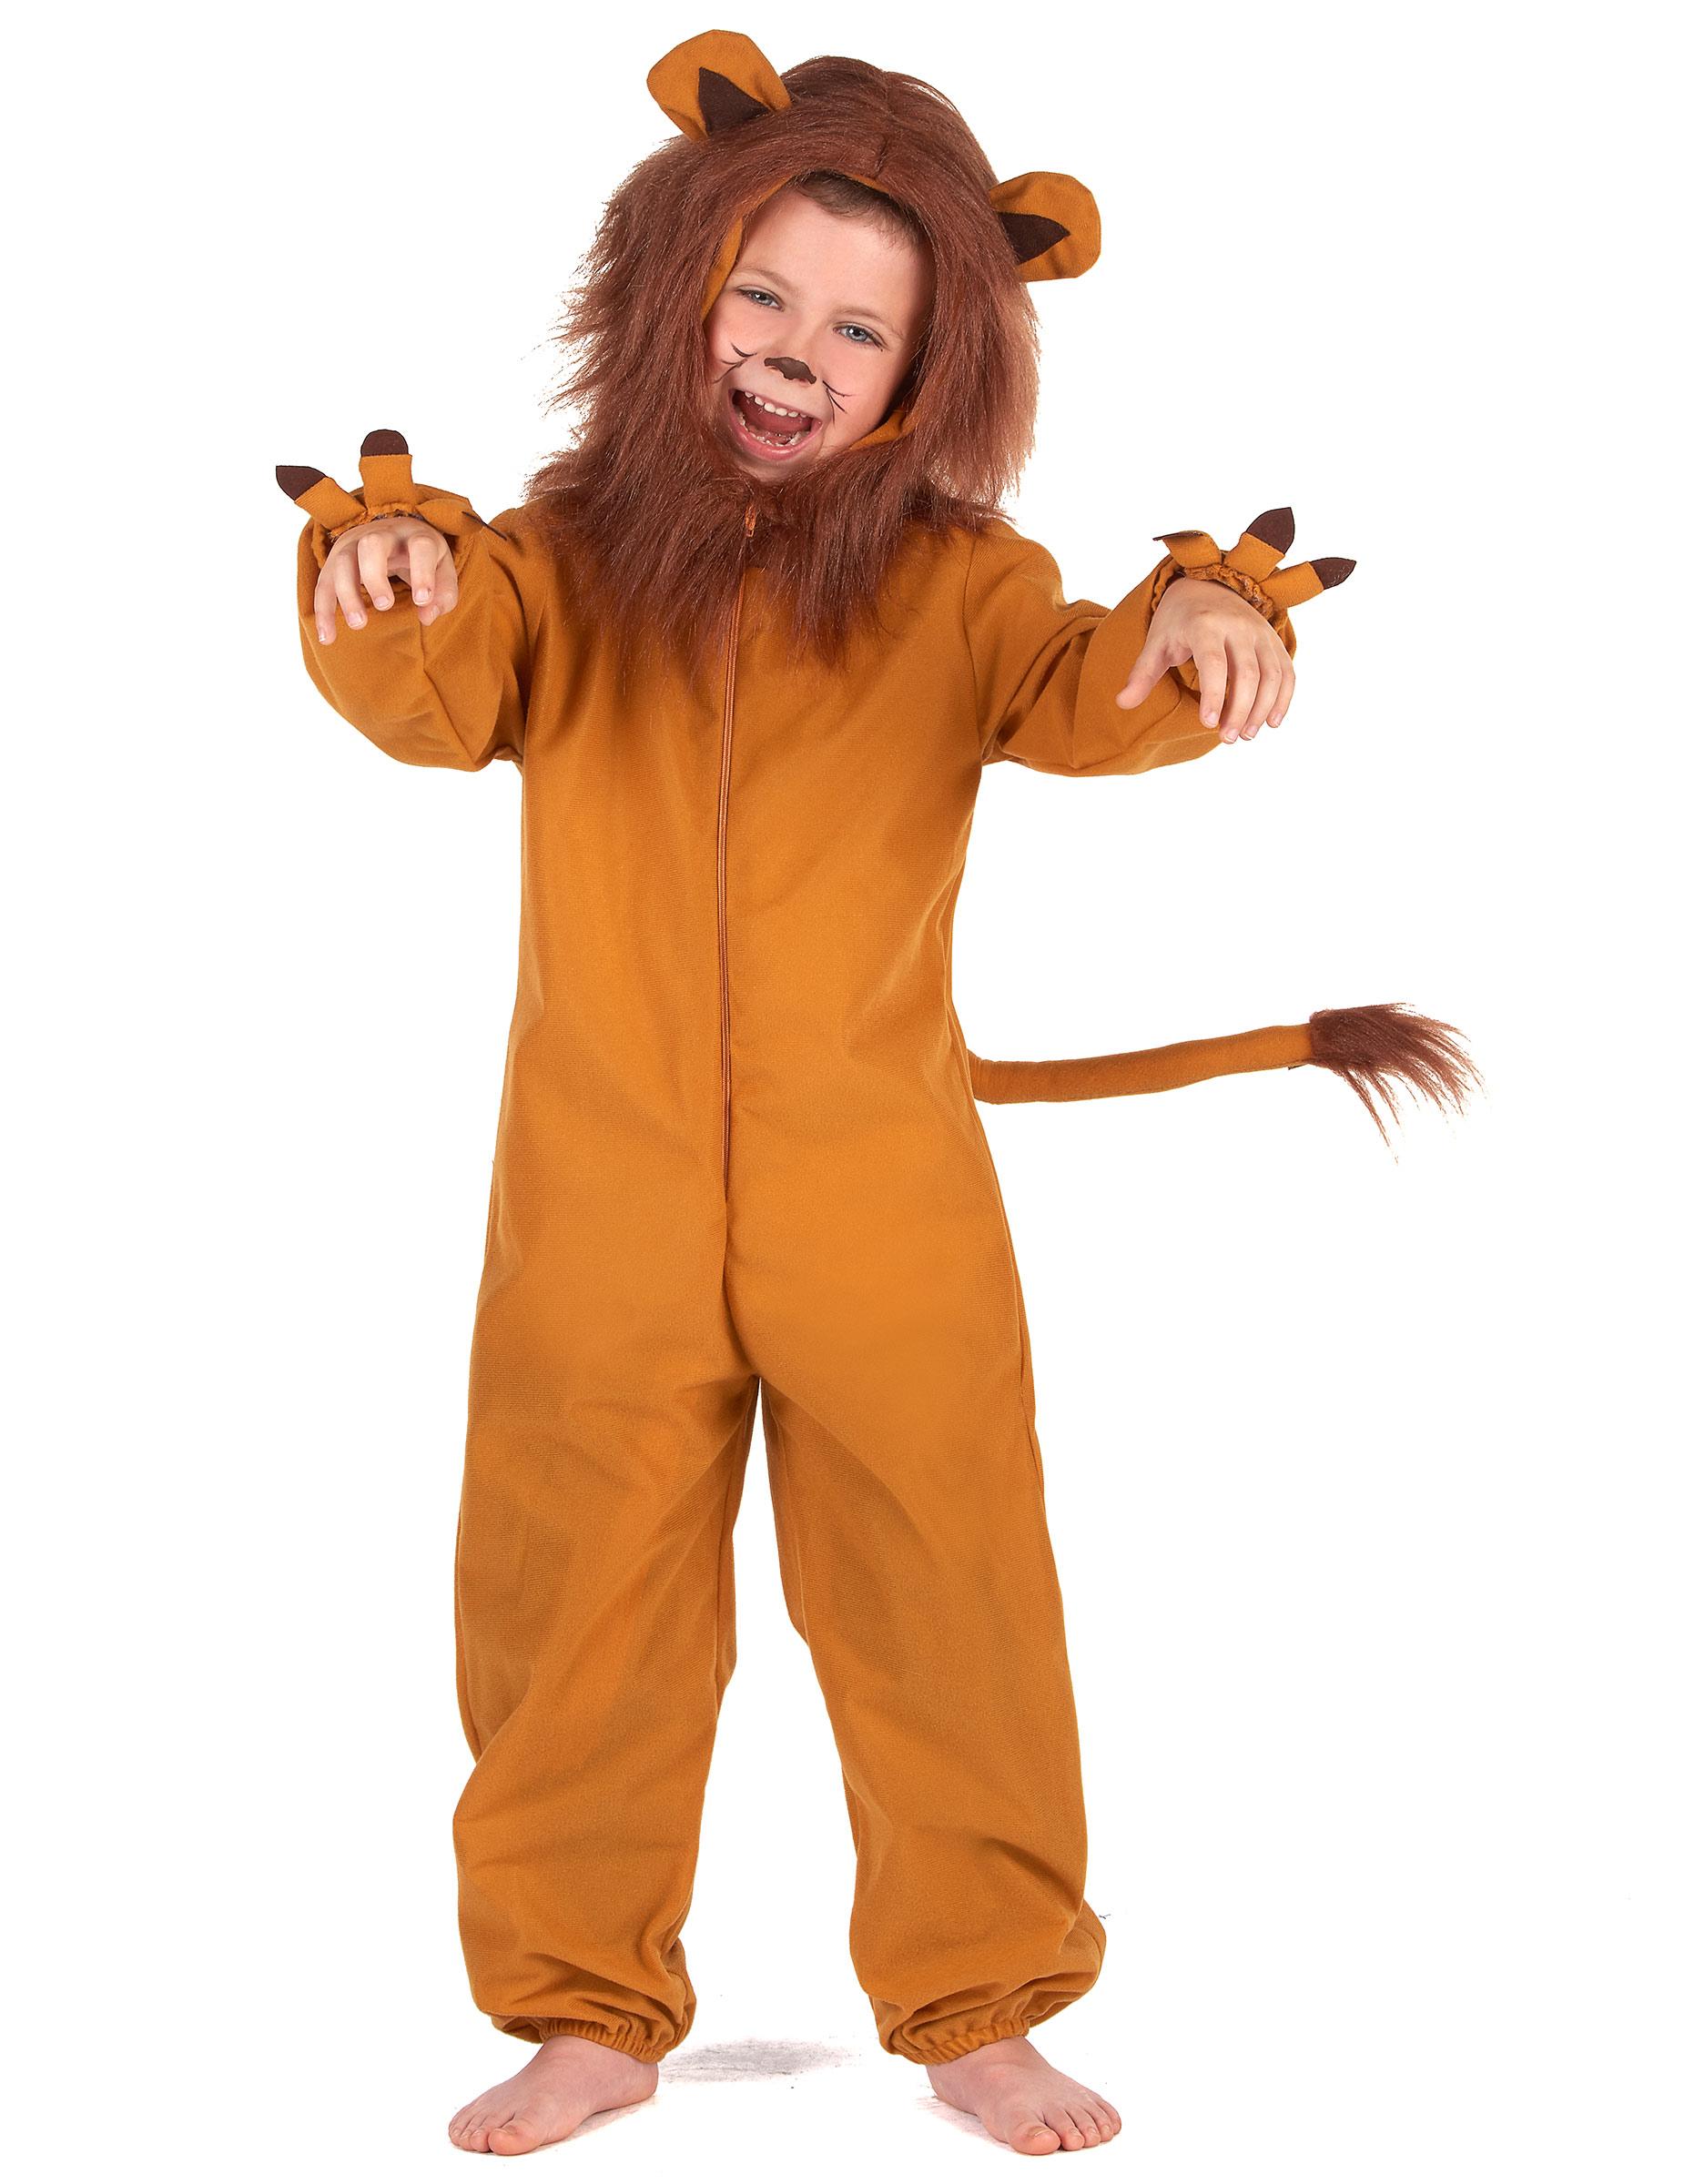 Lowen Kinderkostum Karneval Tier Verkleidung Braun Kostume Fur